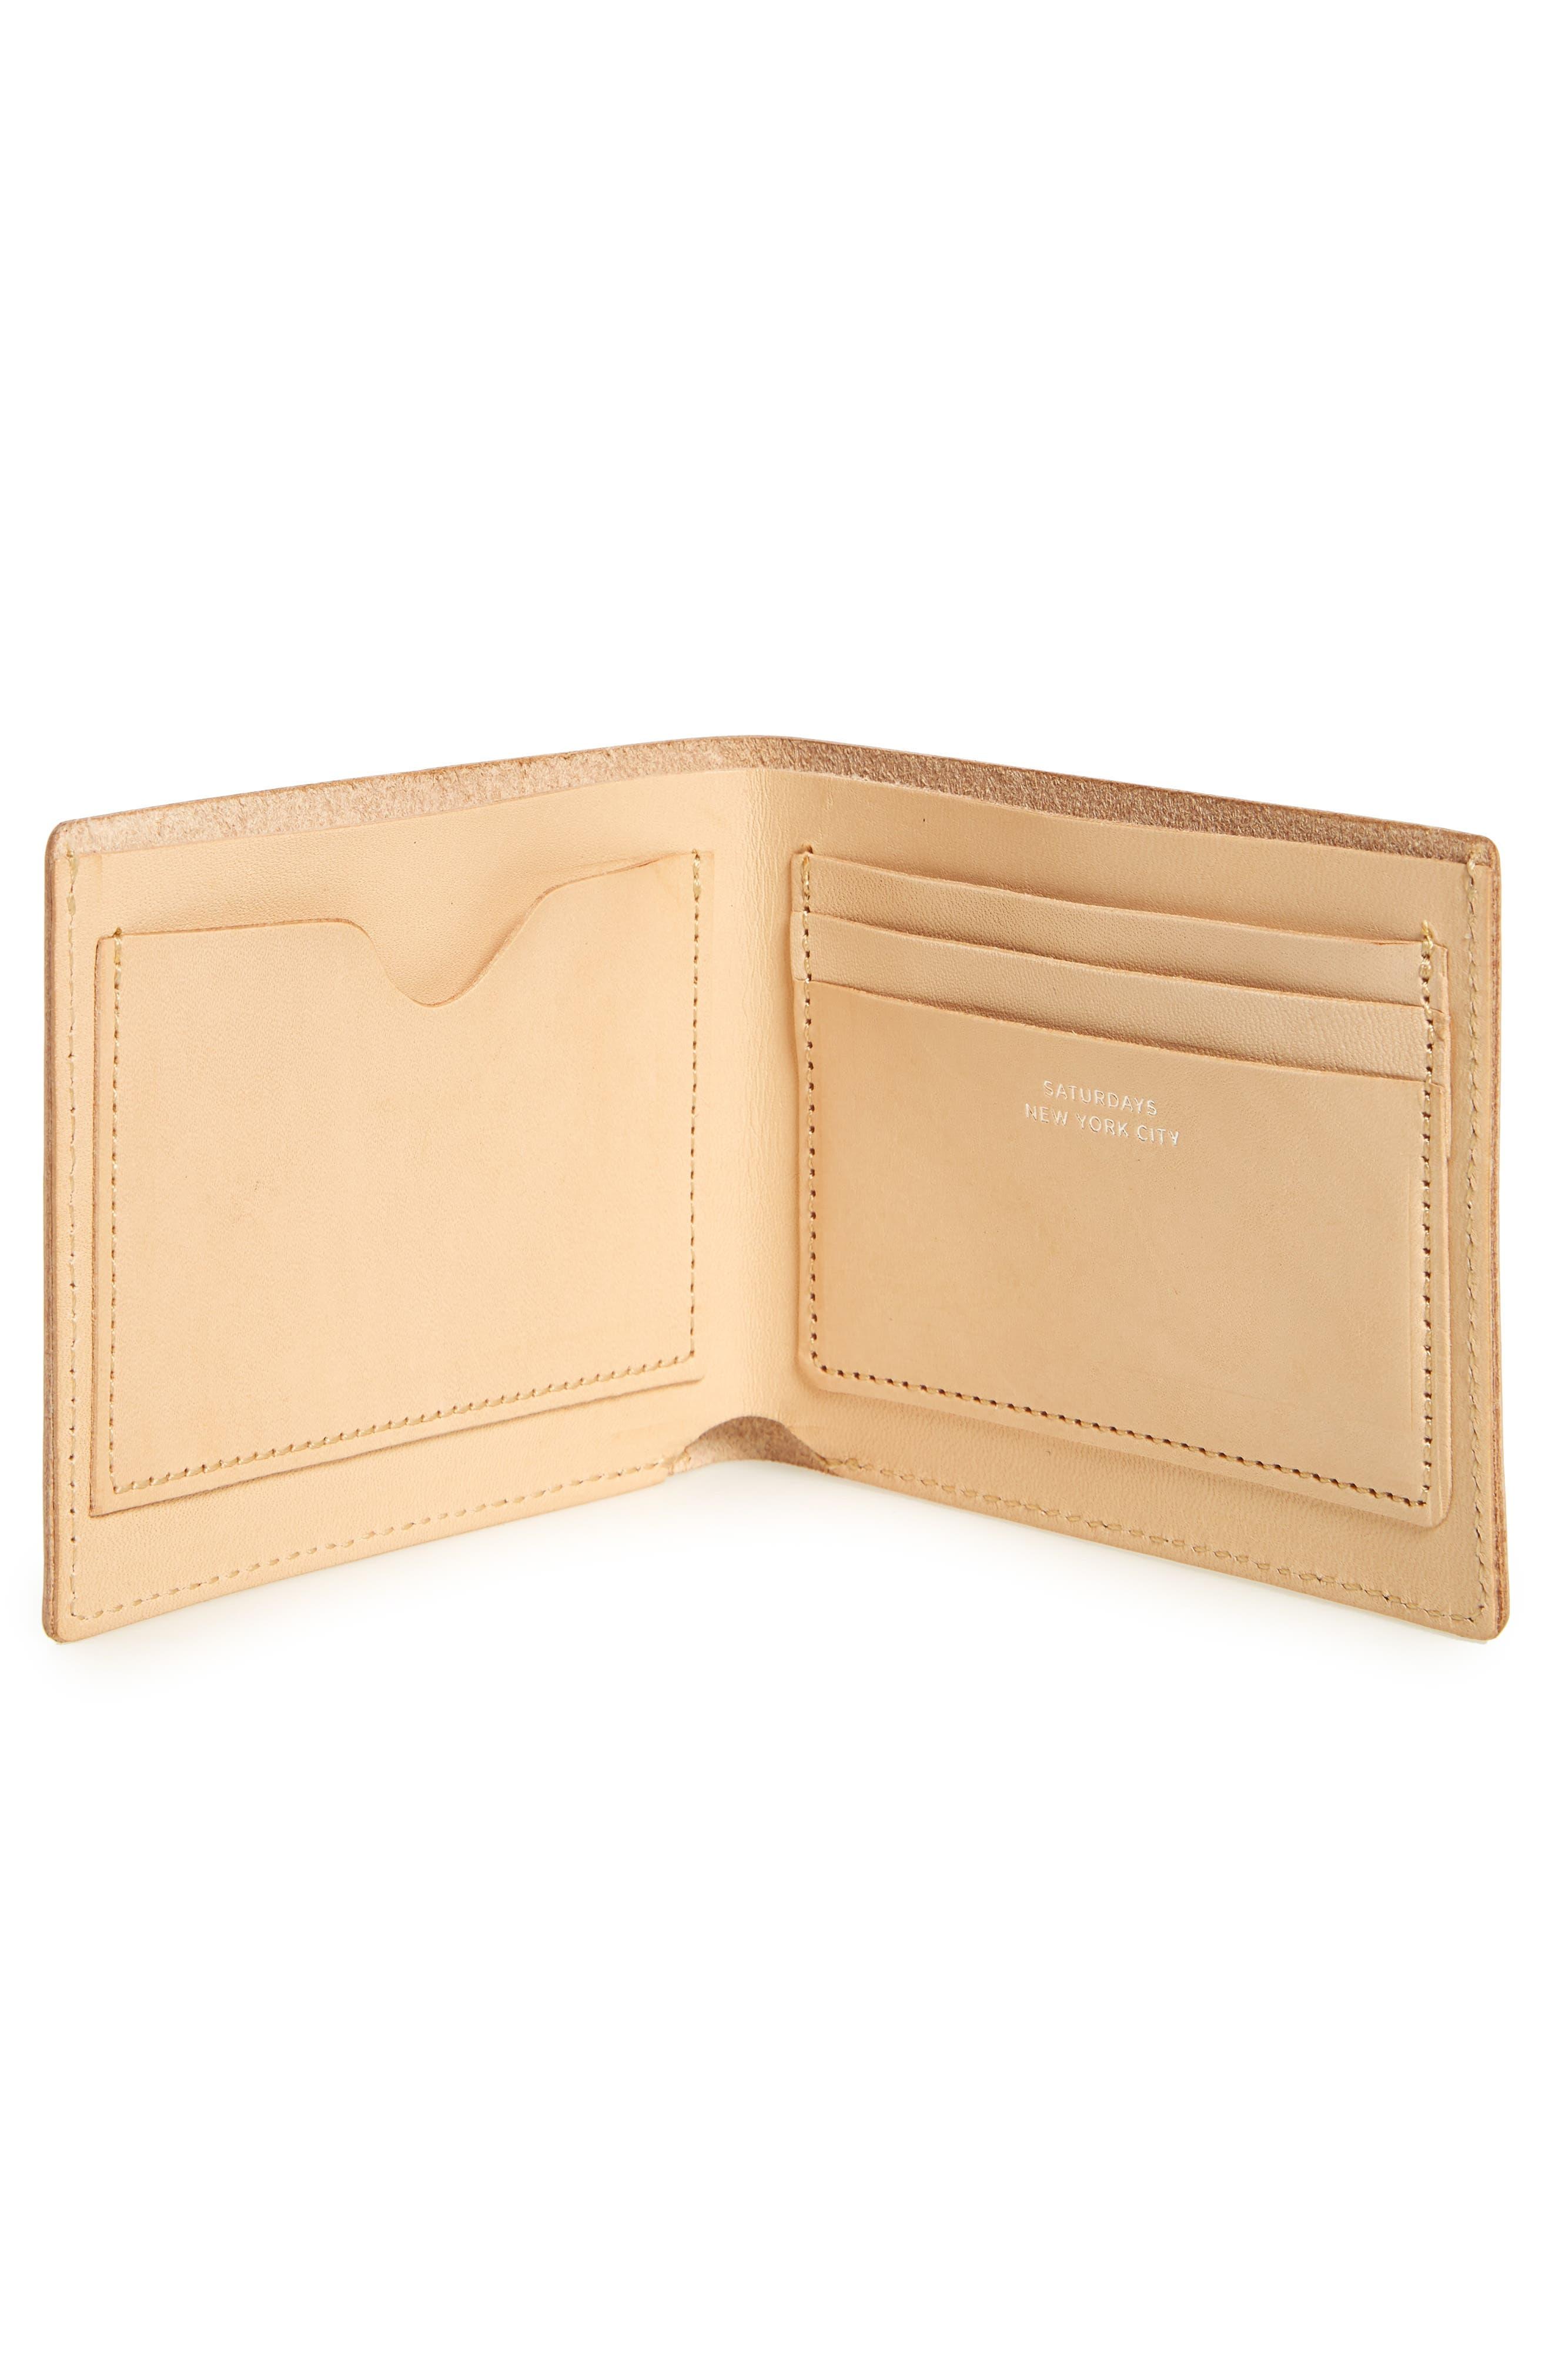 Bifold Leather Wallet,                             Alternate thumbnail 3, color,                             Vegetable Tan